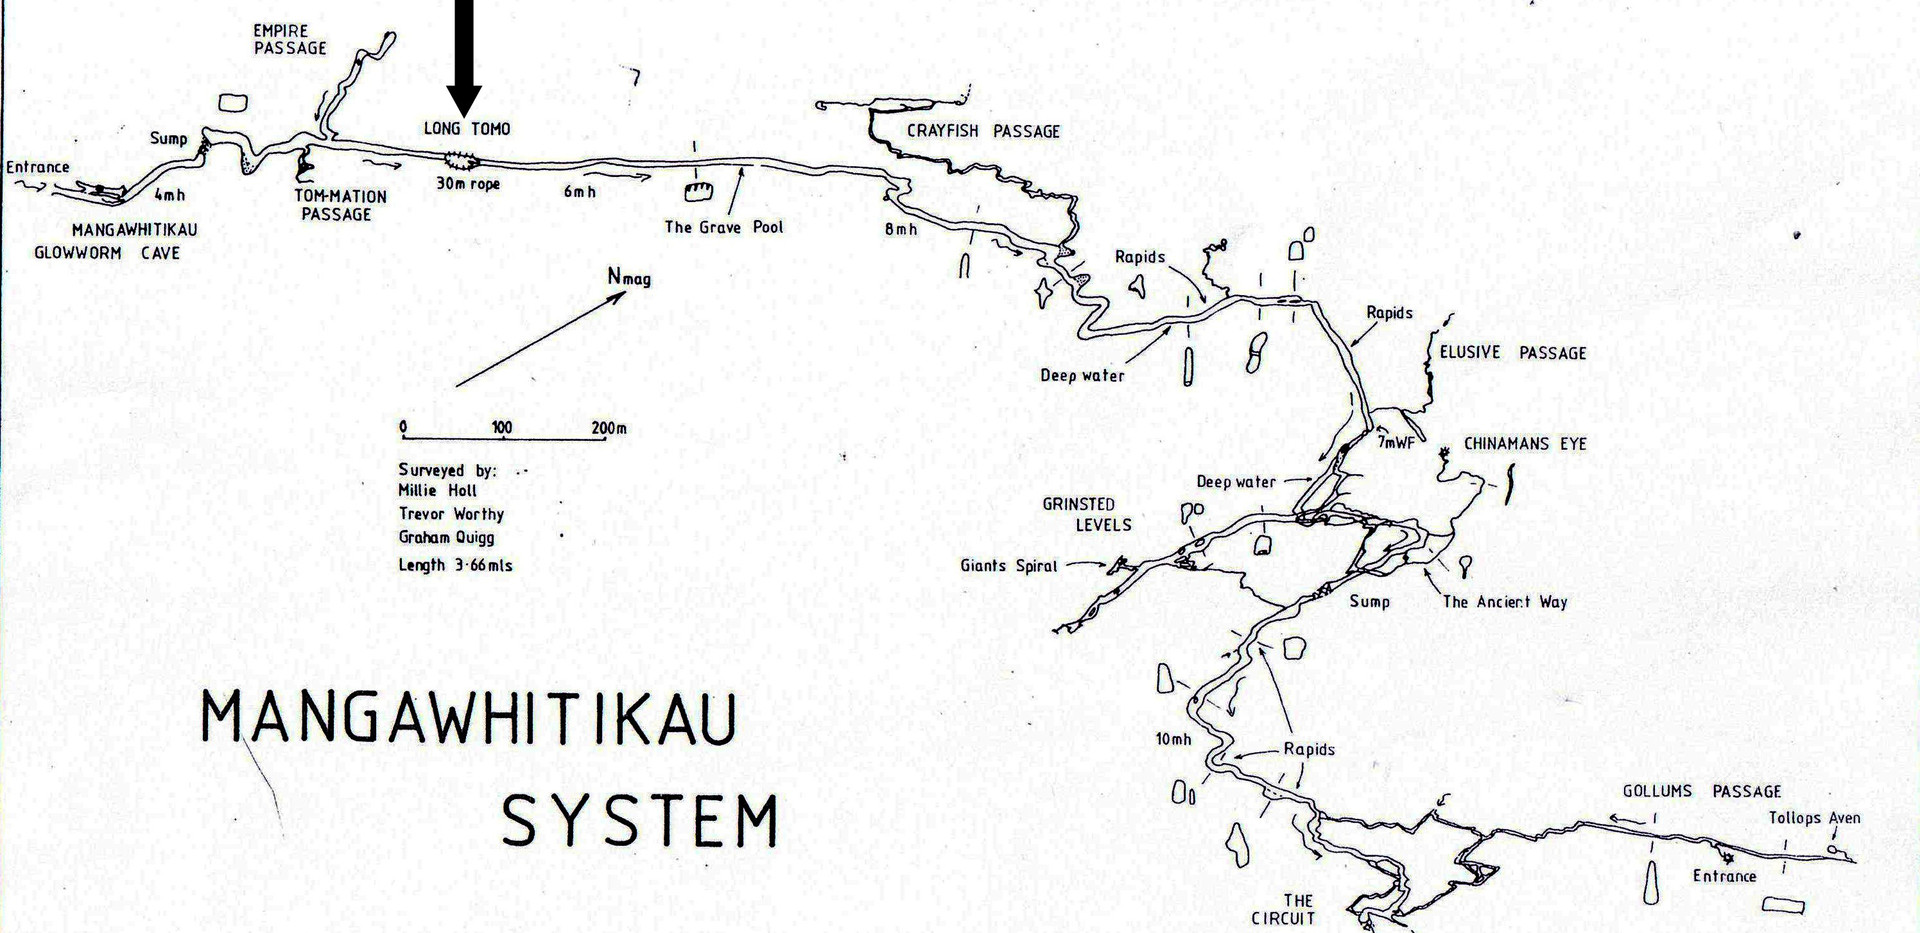 Mangawhitikau Cave Map